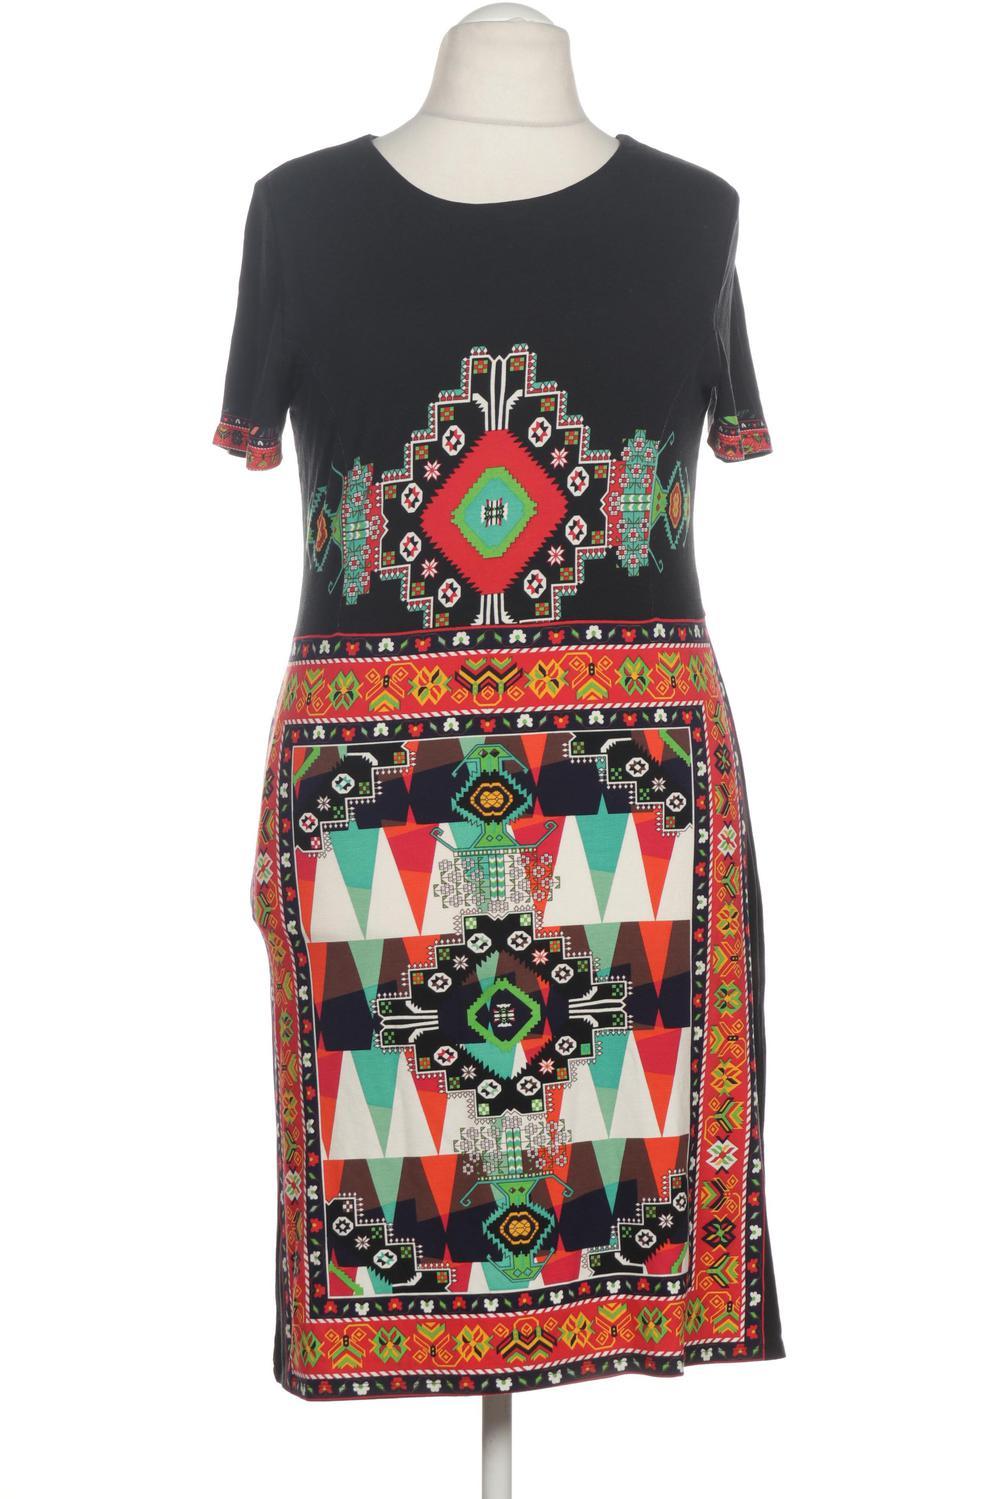 Desigual Kleid Damen Dress Damenkleid Gr. XXL Elasthan ...